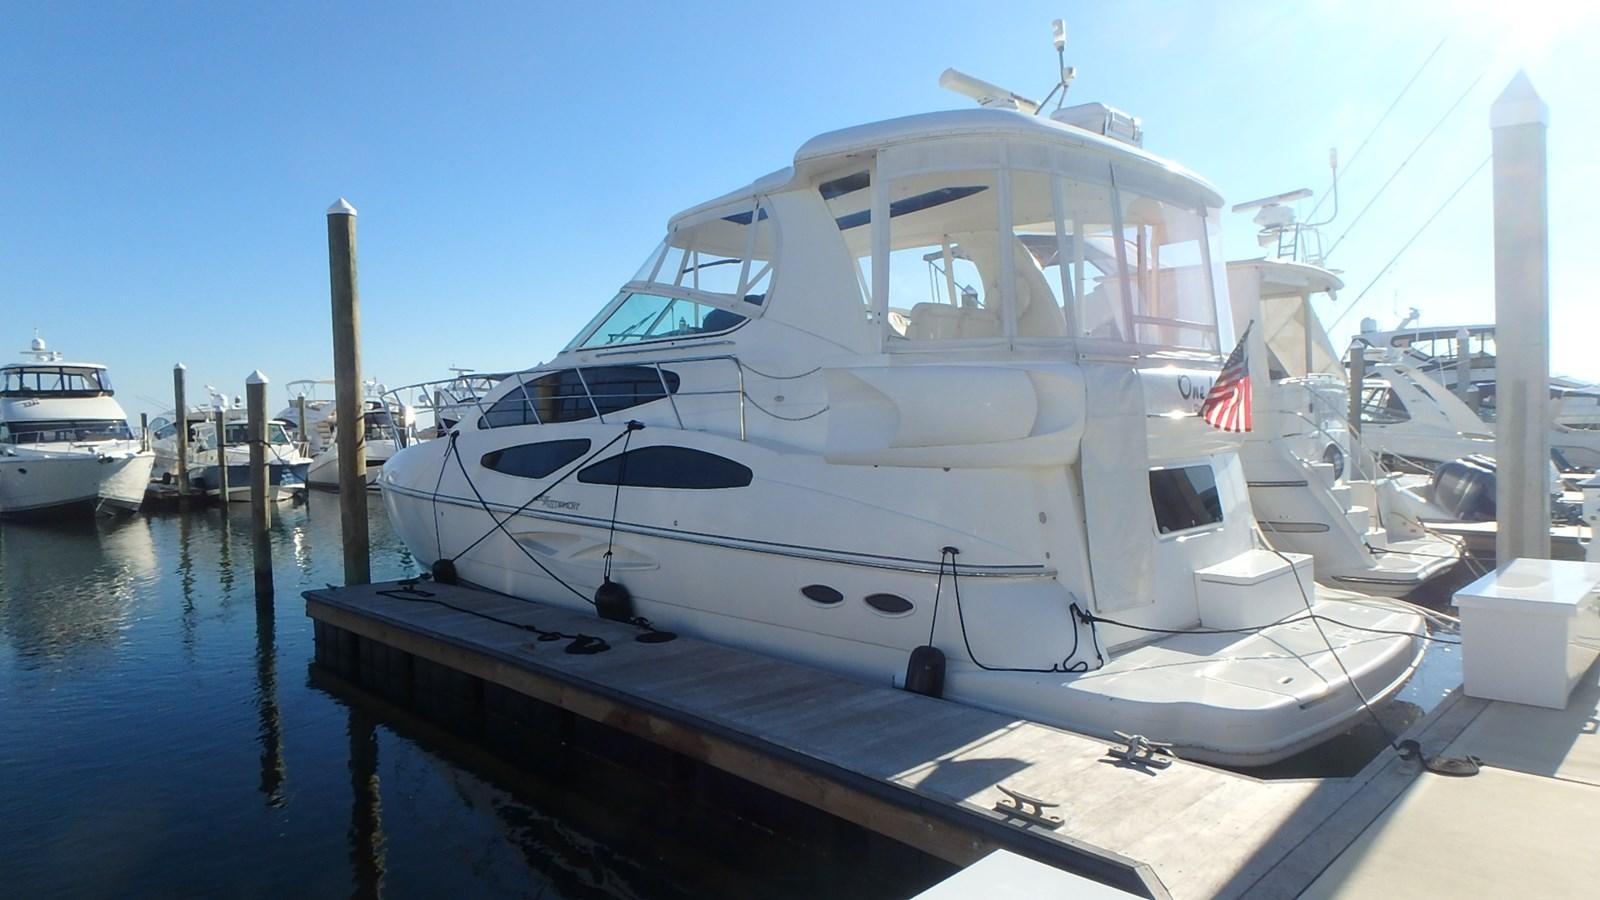 P1160981 2005 CRUISERS YACHTS 455 Express Motoryacht Motor Yacht 2522261